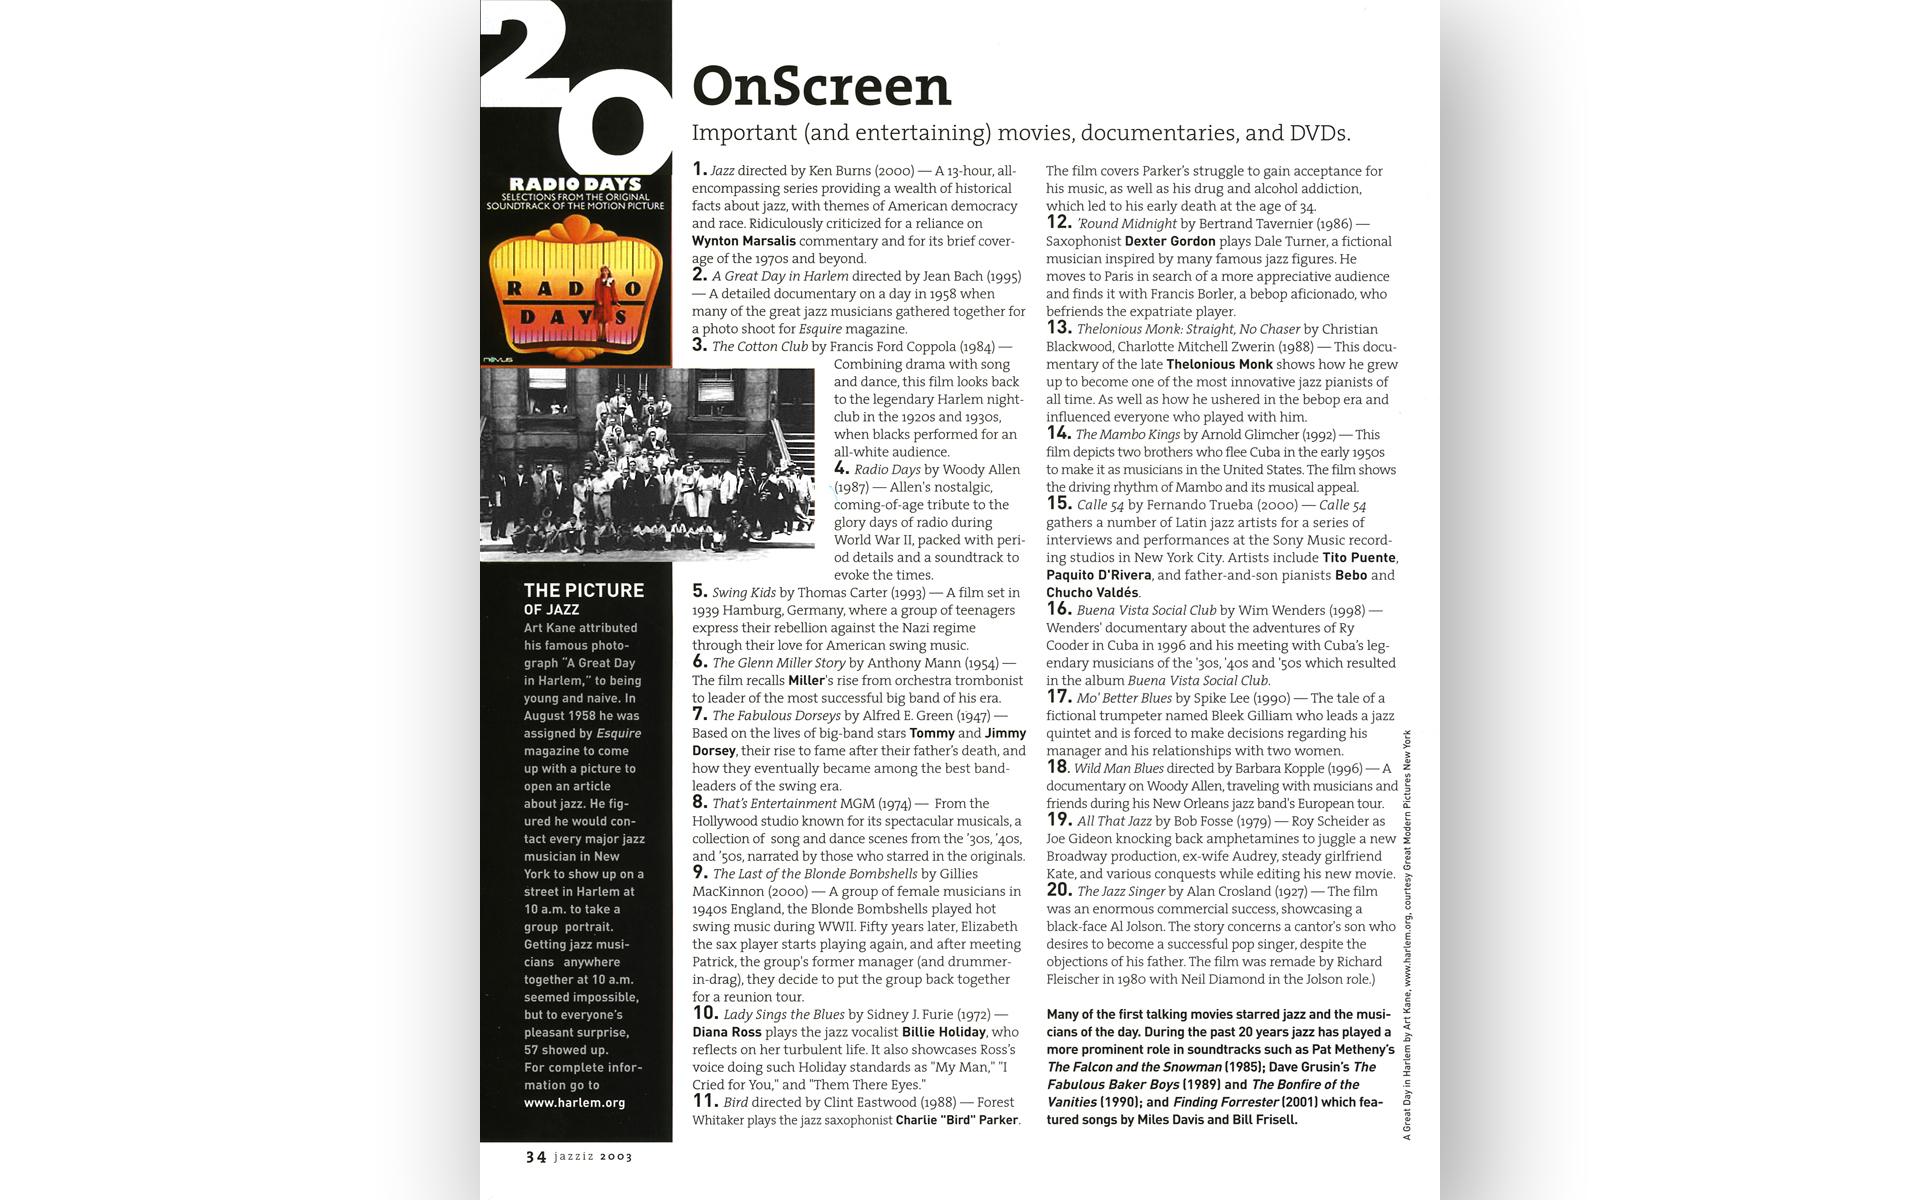 13-OnScreen